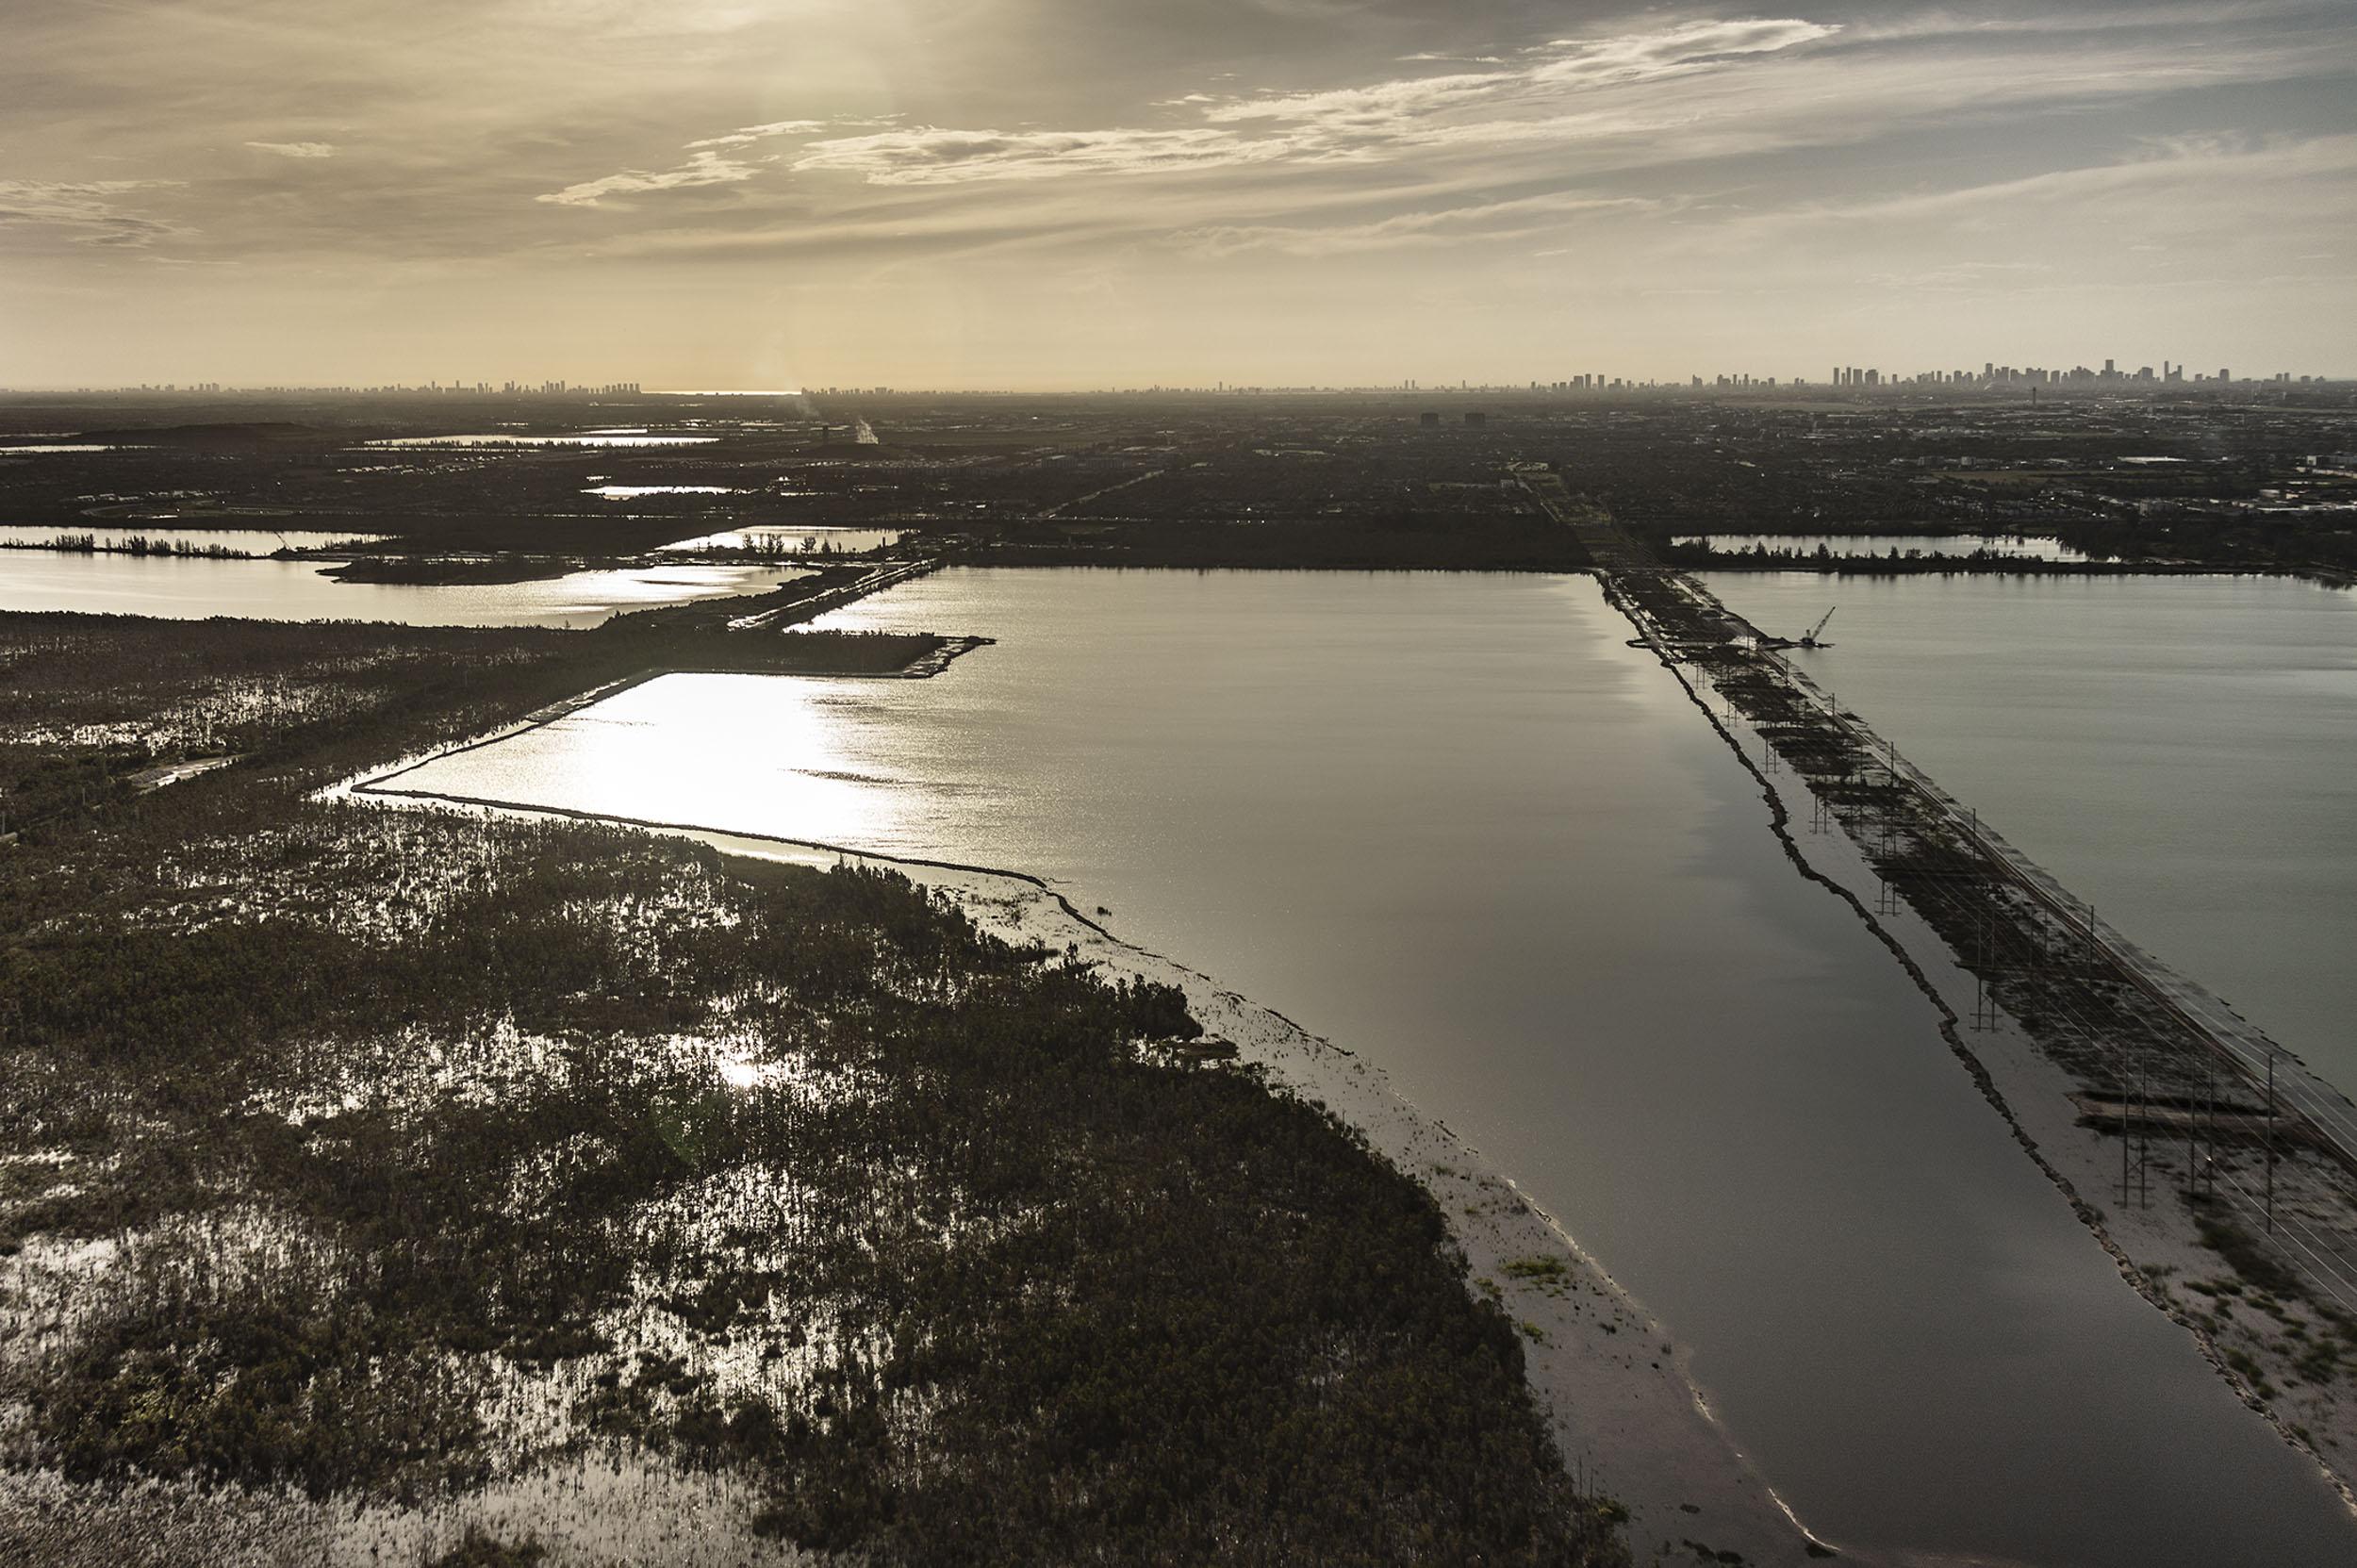 Miami Sinking: Miami Will Be Underwater Soon  Its Drinking